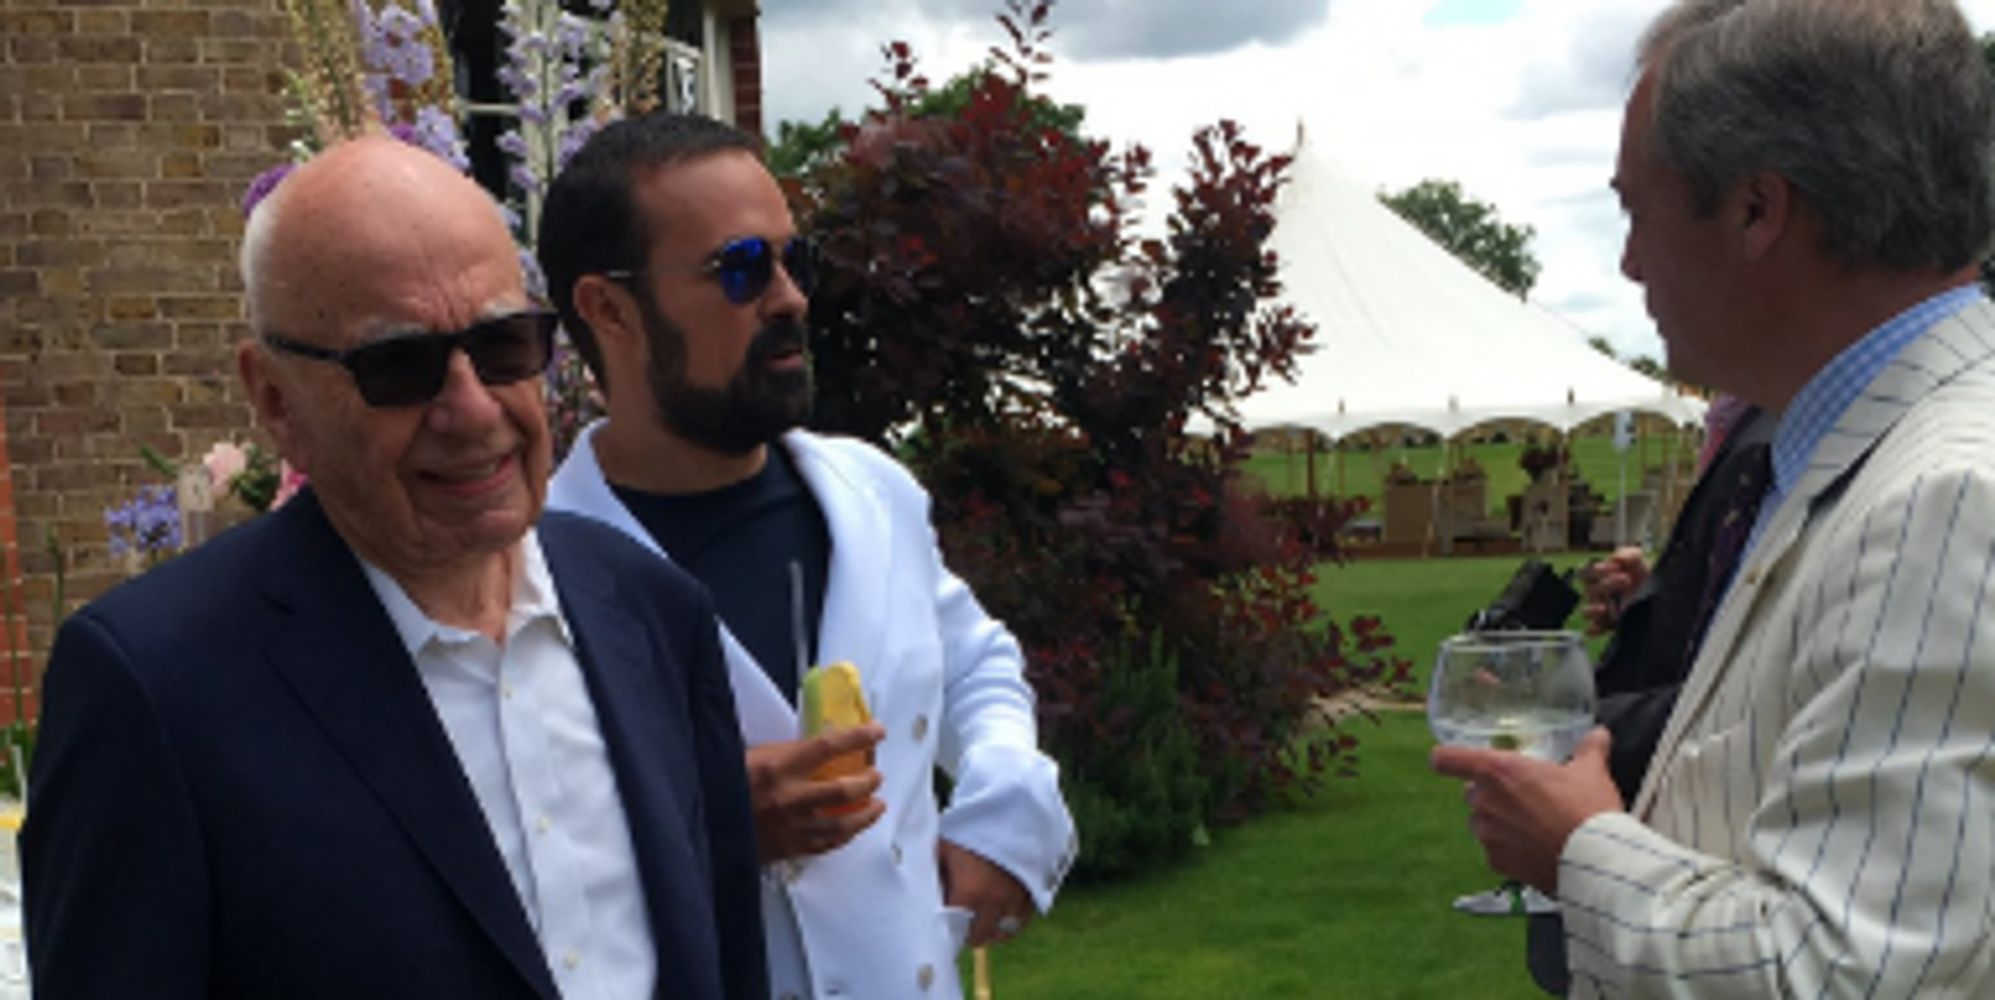 Lily Allen Tweets Pictures Of Nigel Farage, Rupert Murdoch At Lavish Garden Party